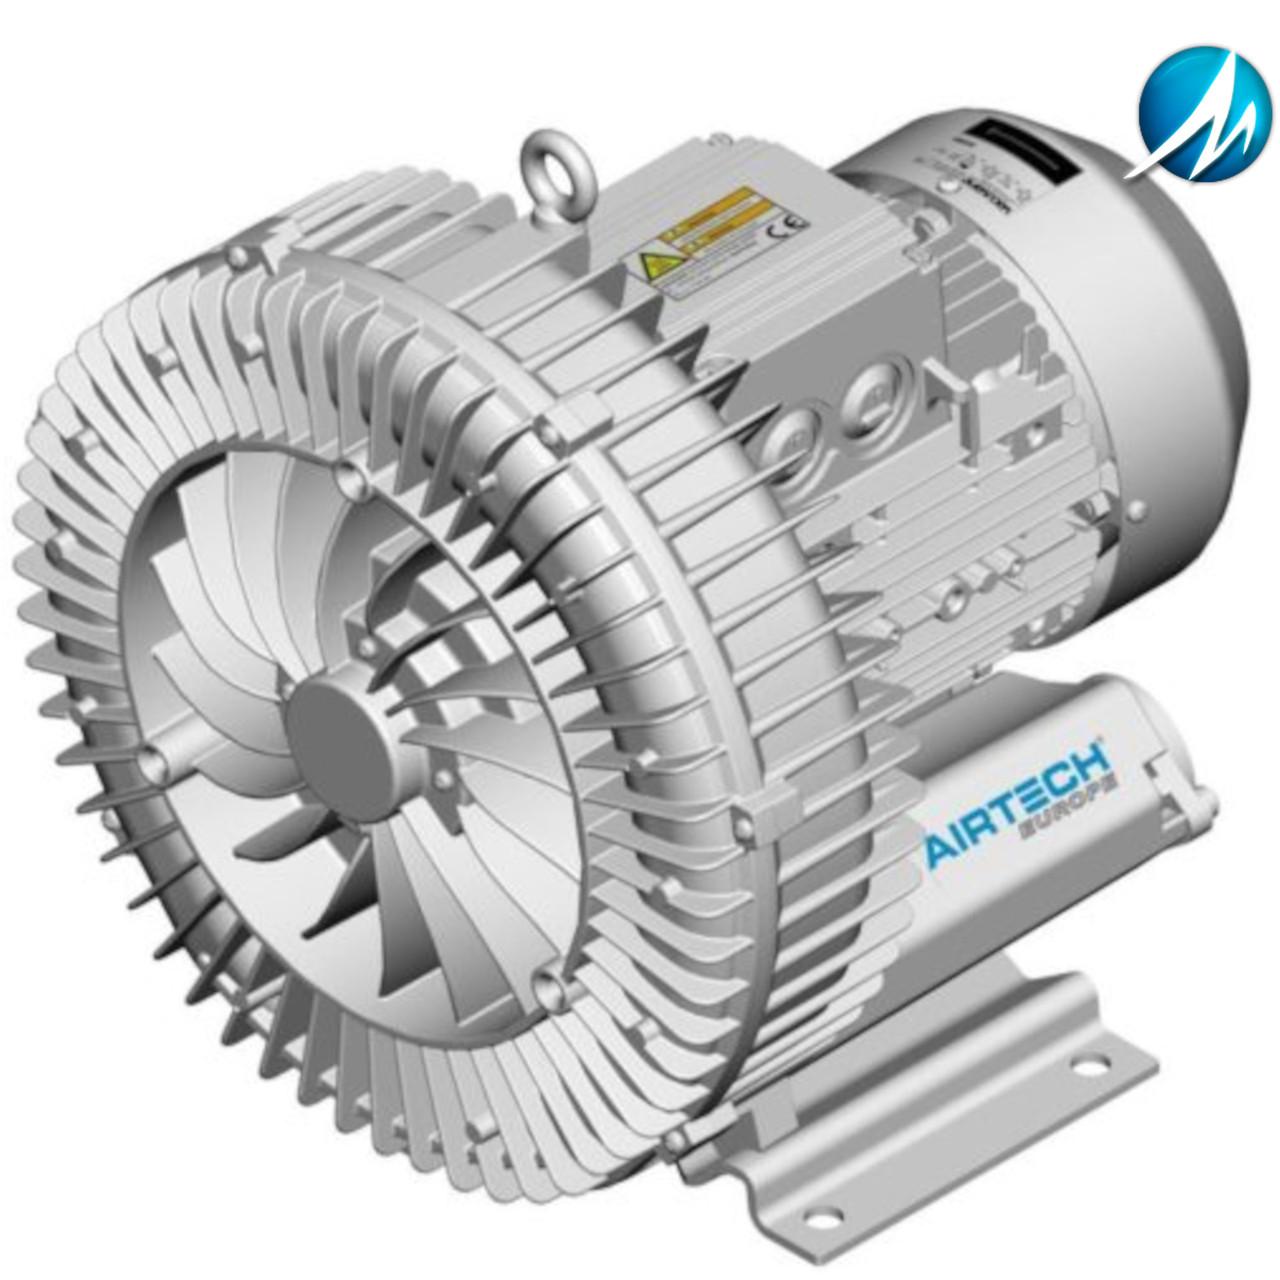 Компрессор HPE AIRTECH 0,8 кВт (140 м³/ч, 160 мБар, 230 В)